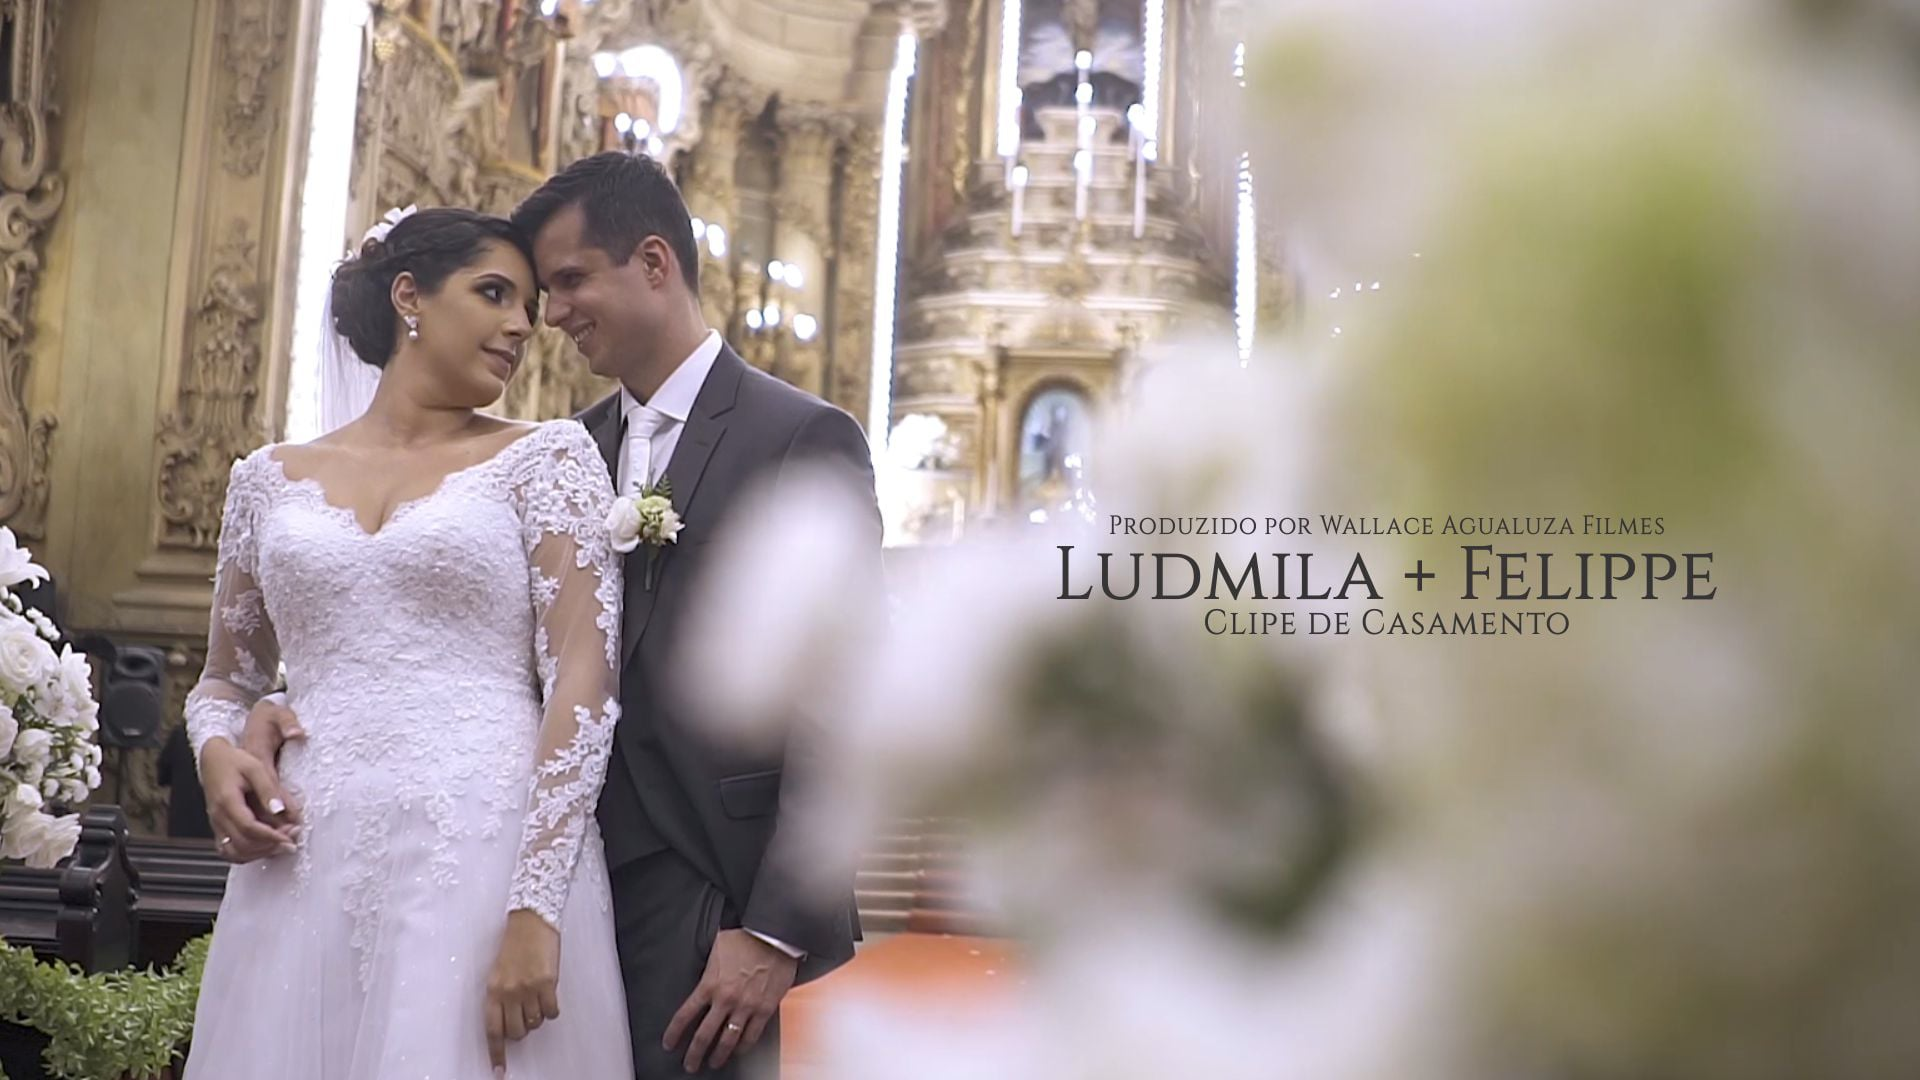 Ludmila e Felippe | Clipe de Casamento